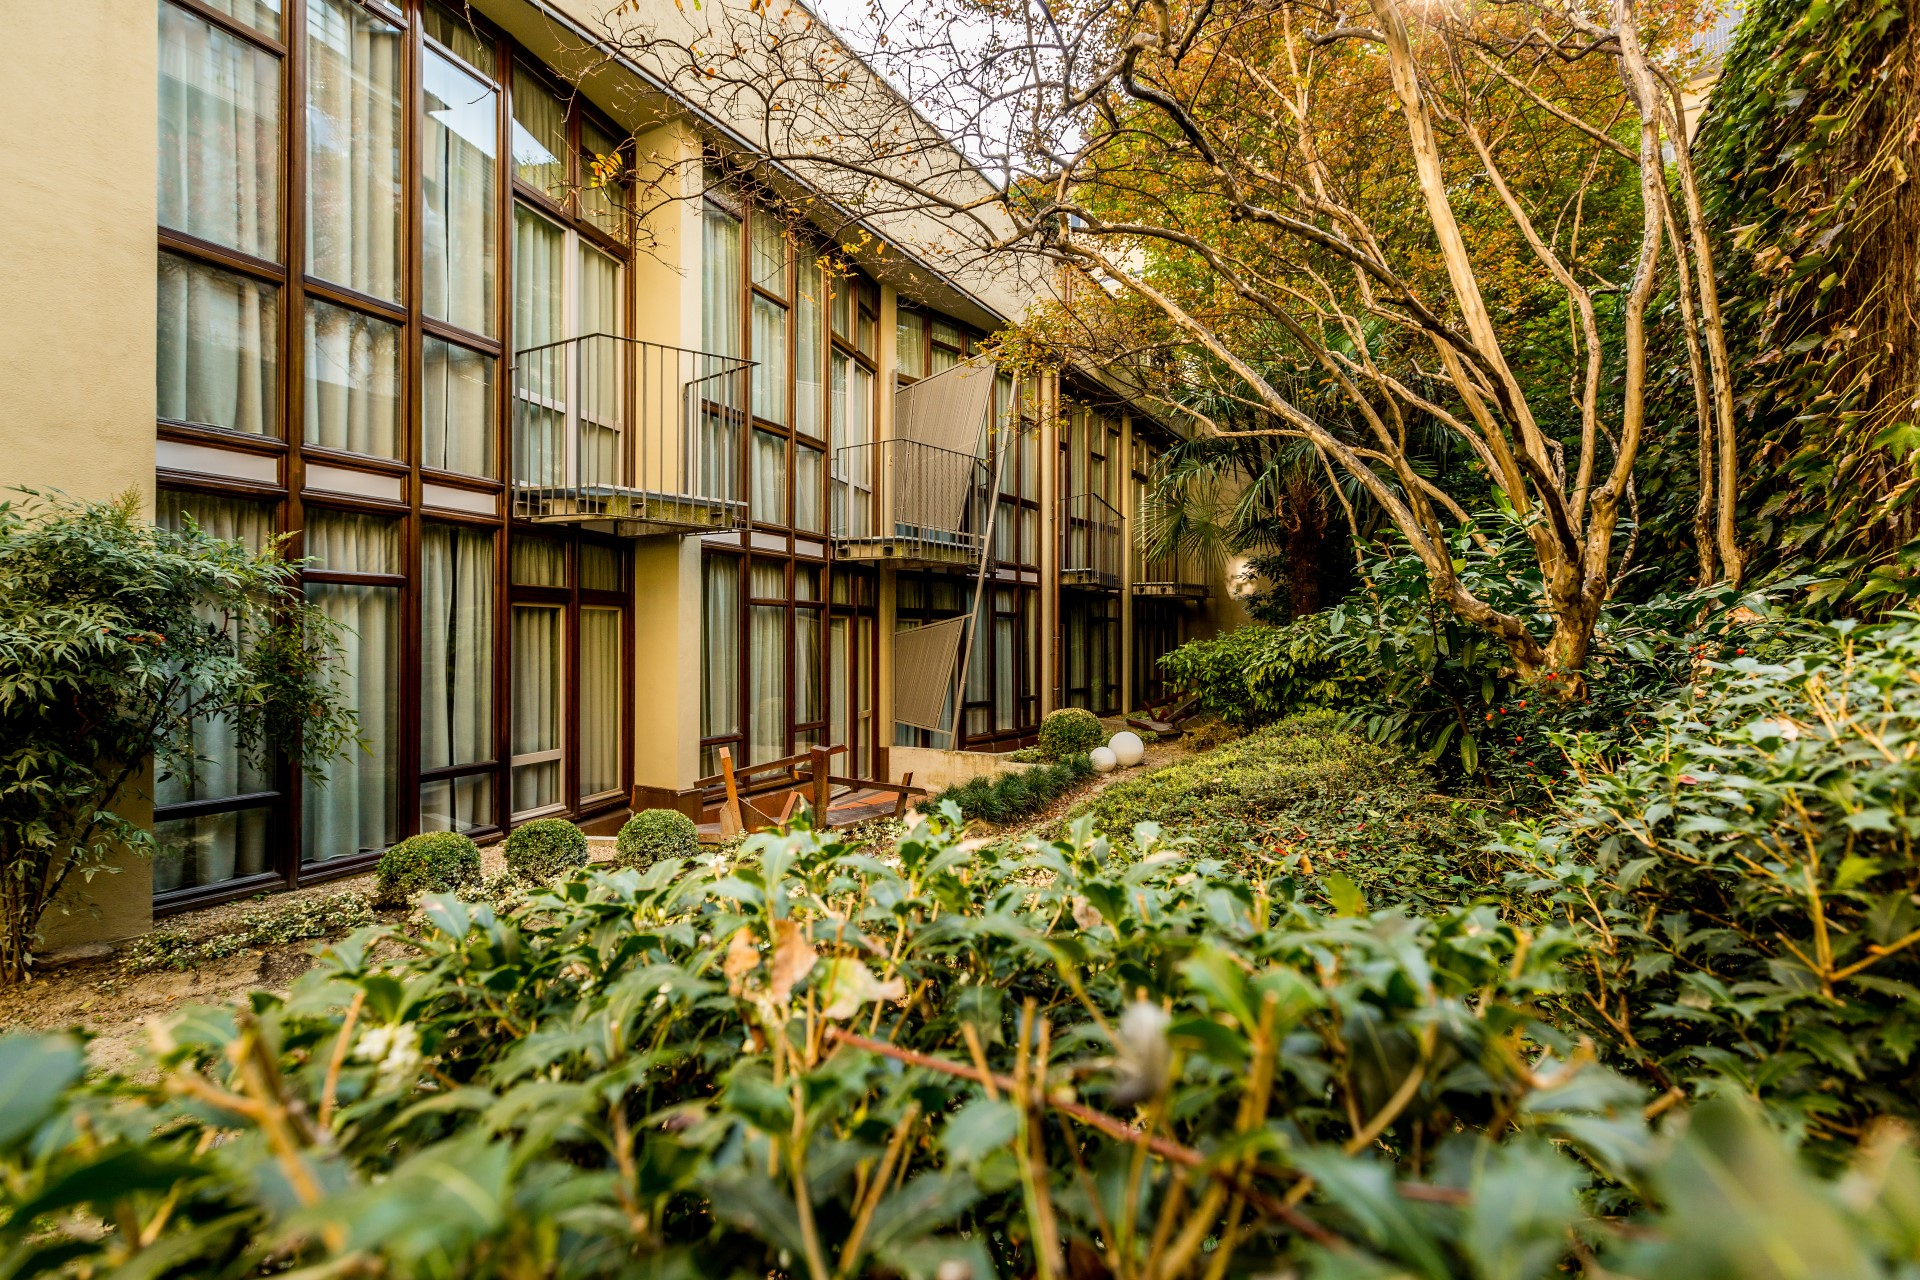 Affitto appartamenti di lusso torino juvarra house for Appartamenti arredati moderni